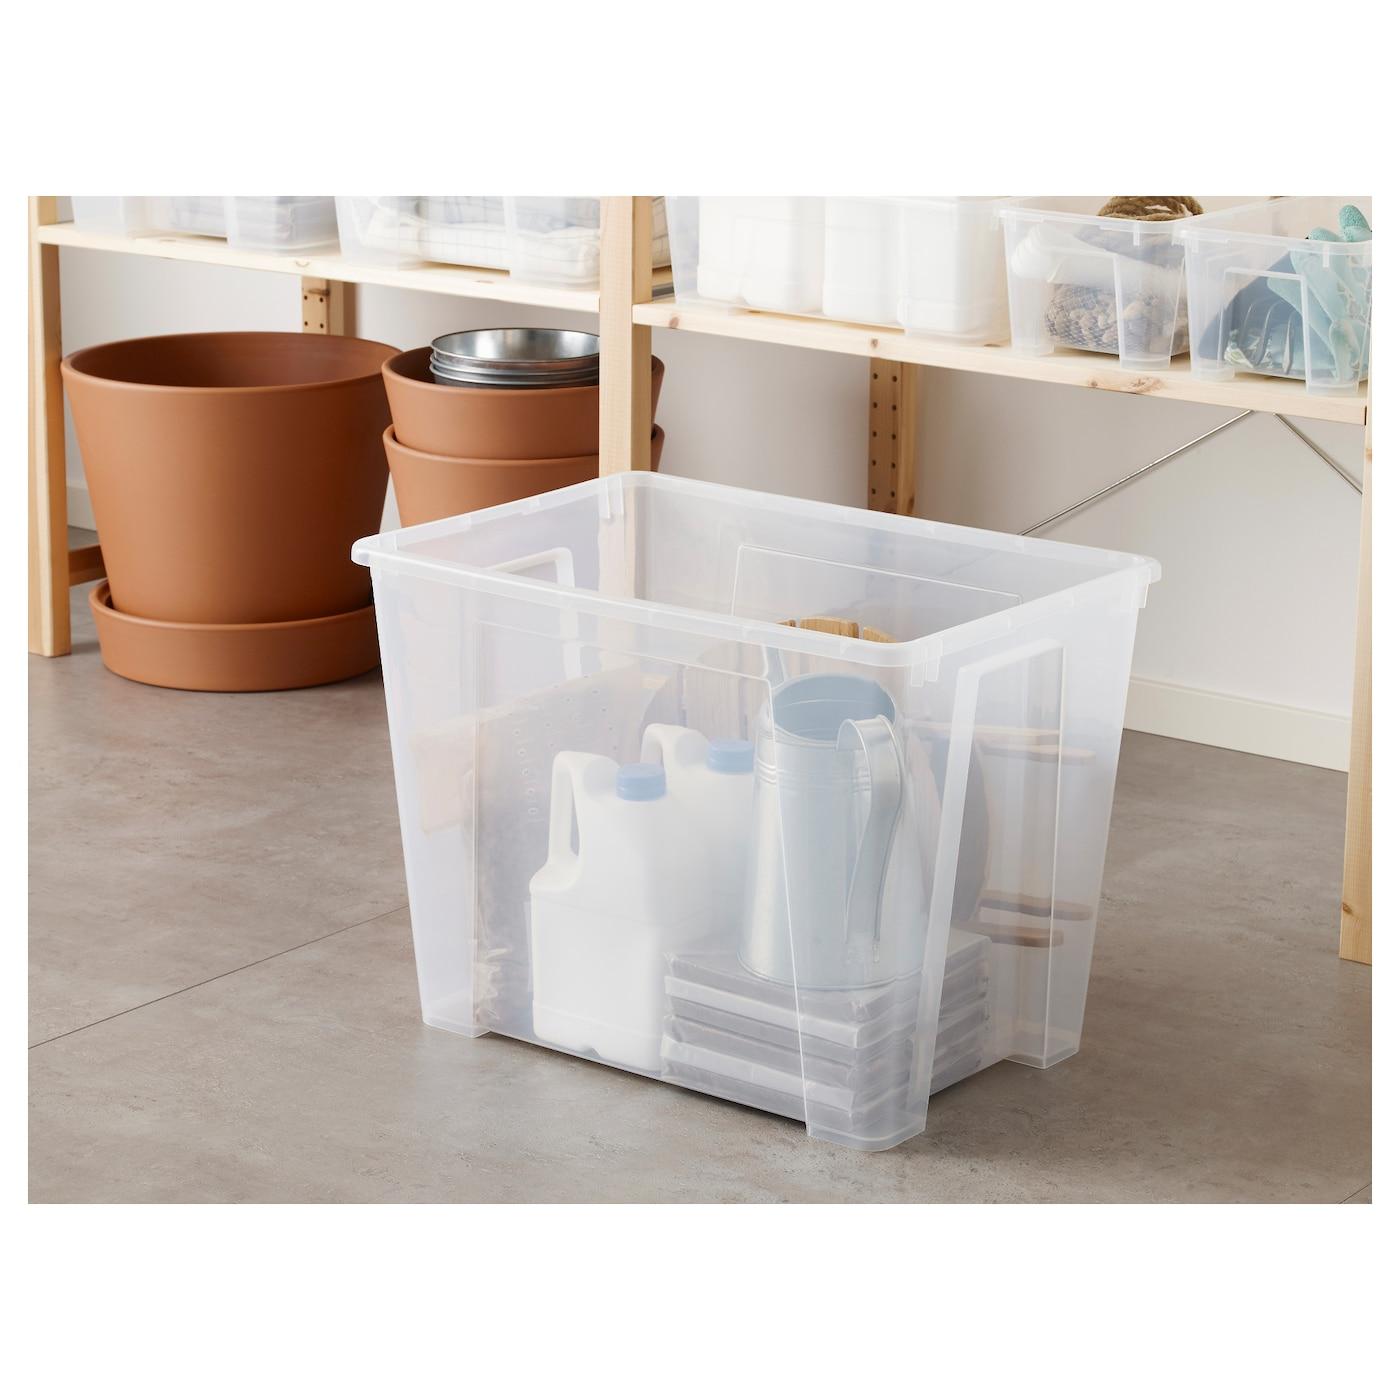 "SAMLA Box, transparent, 22x15 ¼x16 ½ ""/17 gallon"